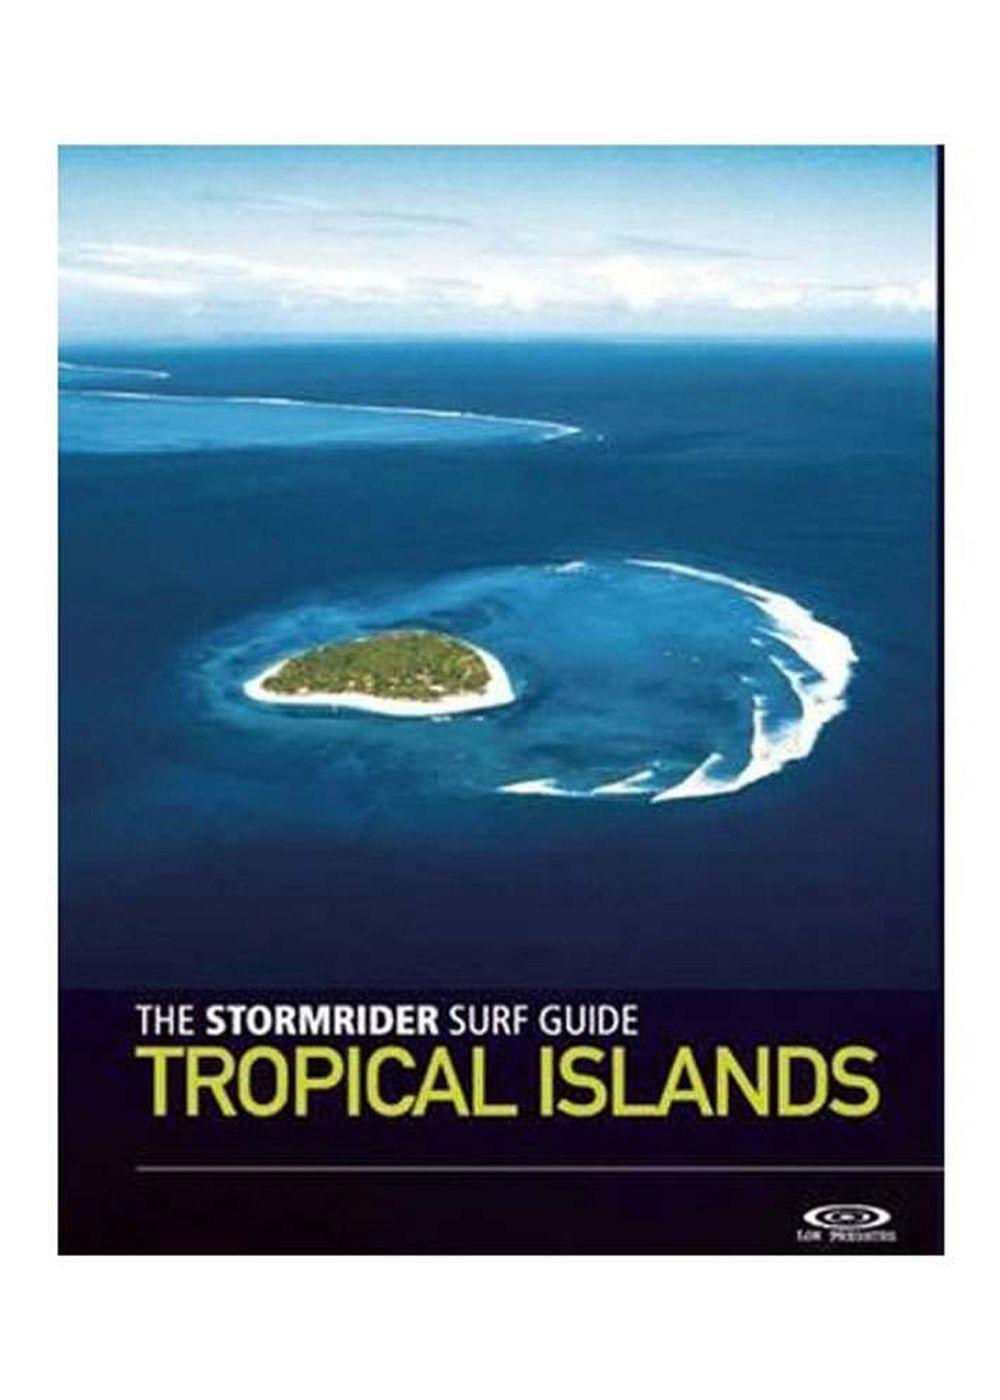 STORMRIDER GUIDE TROPICAL ISLANDS